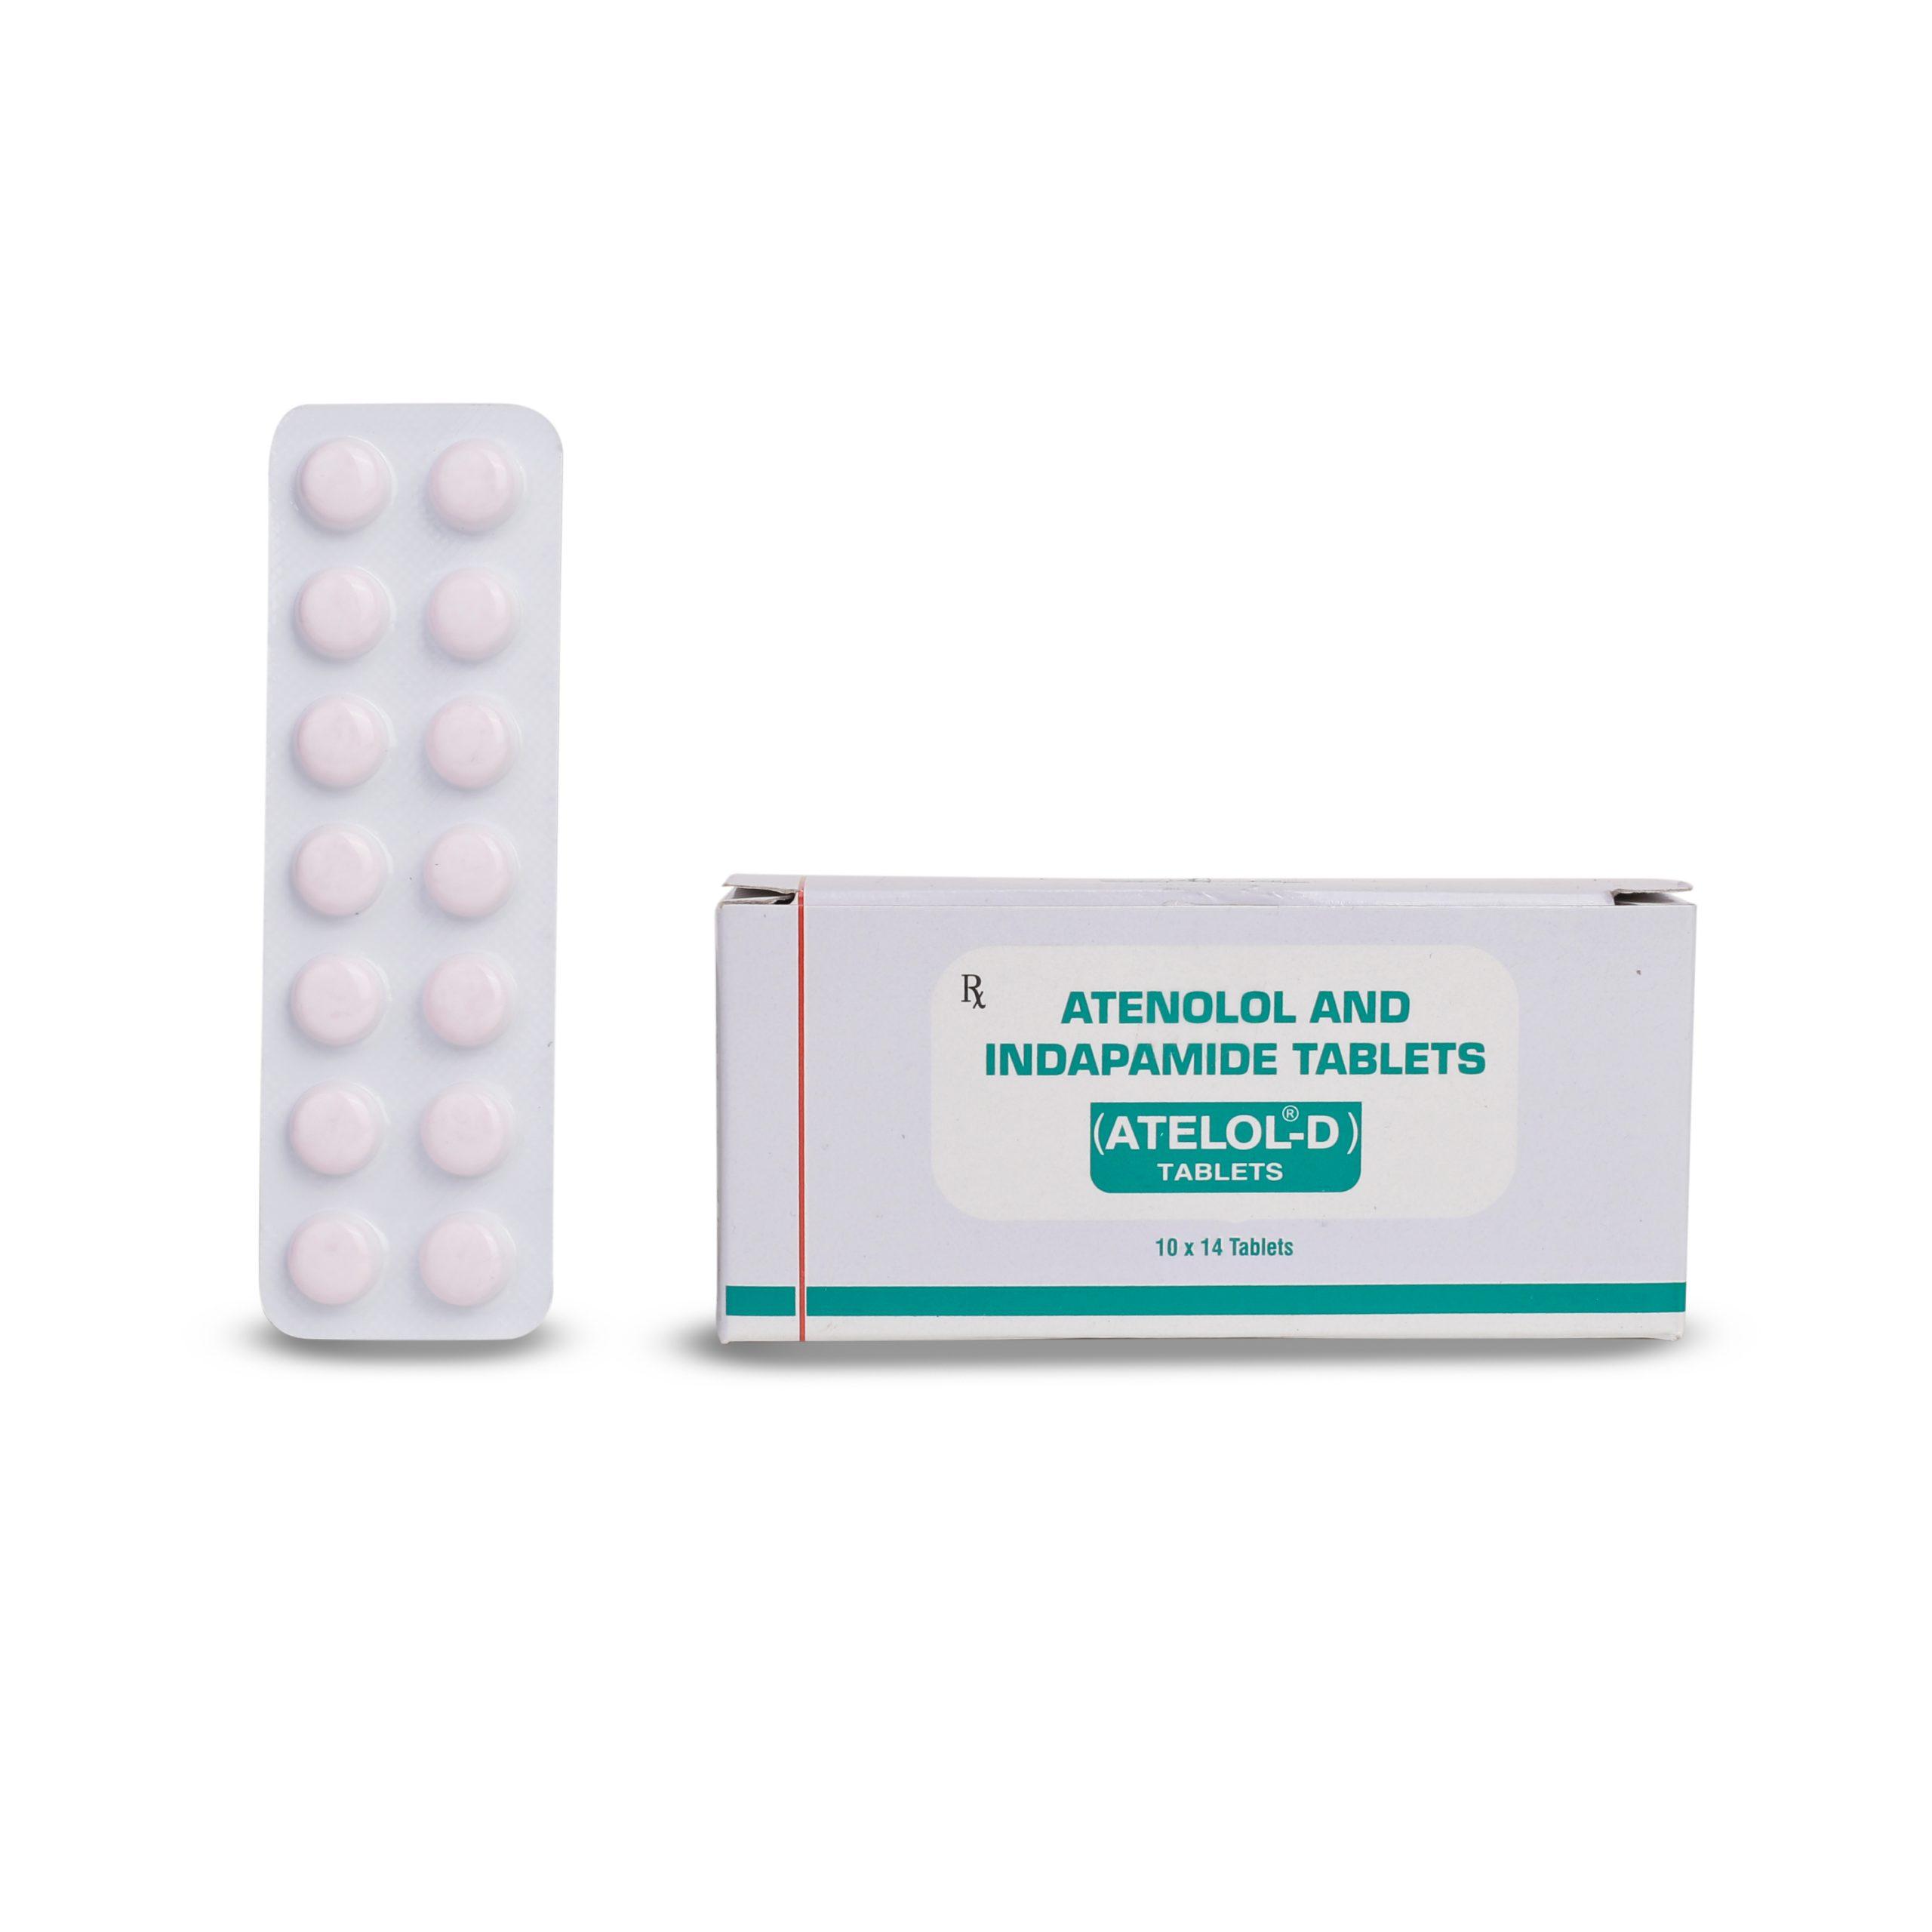 ATELOL-D Tablets